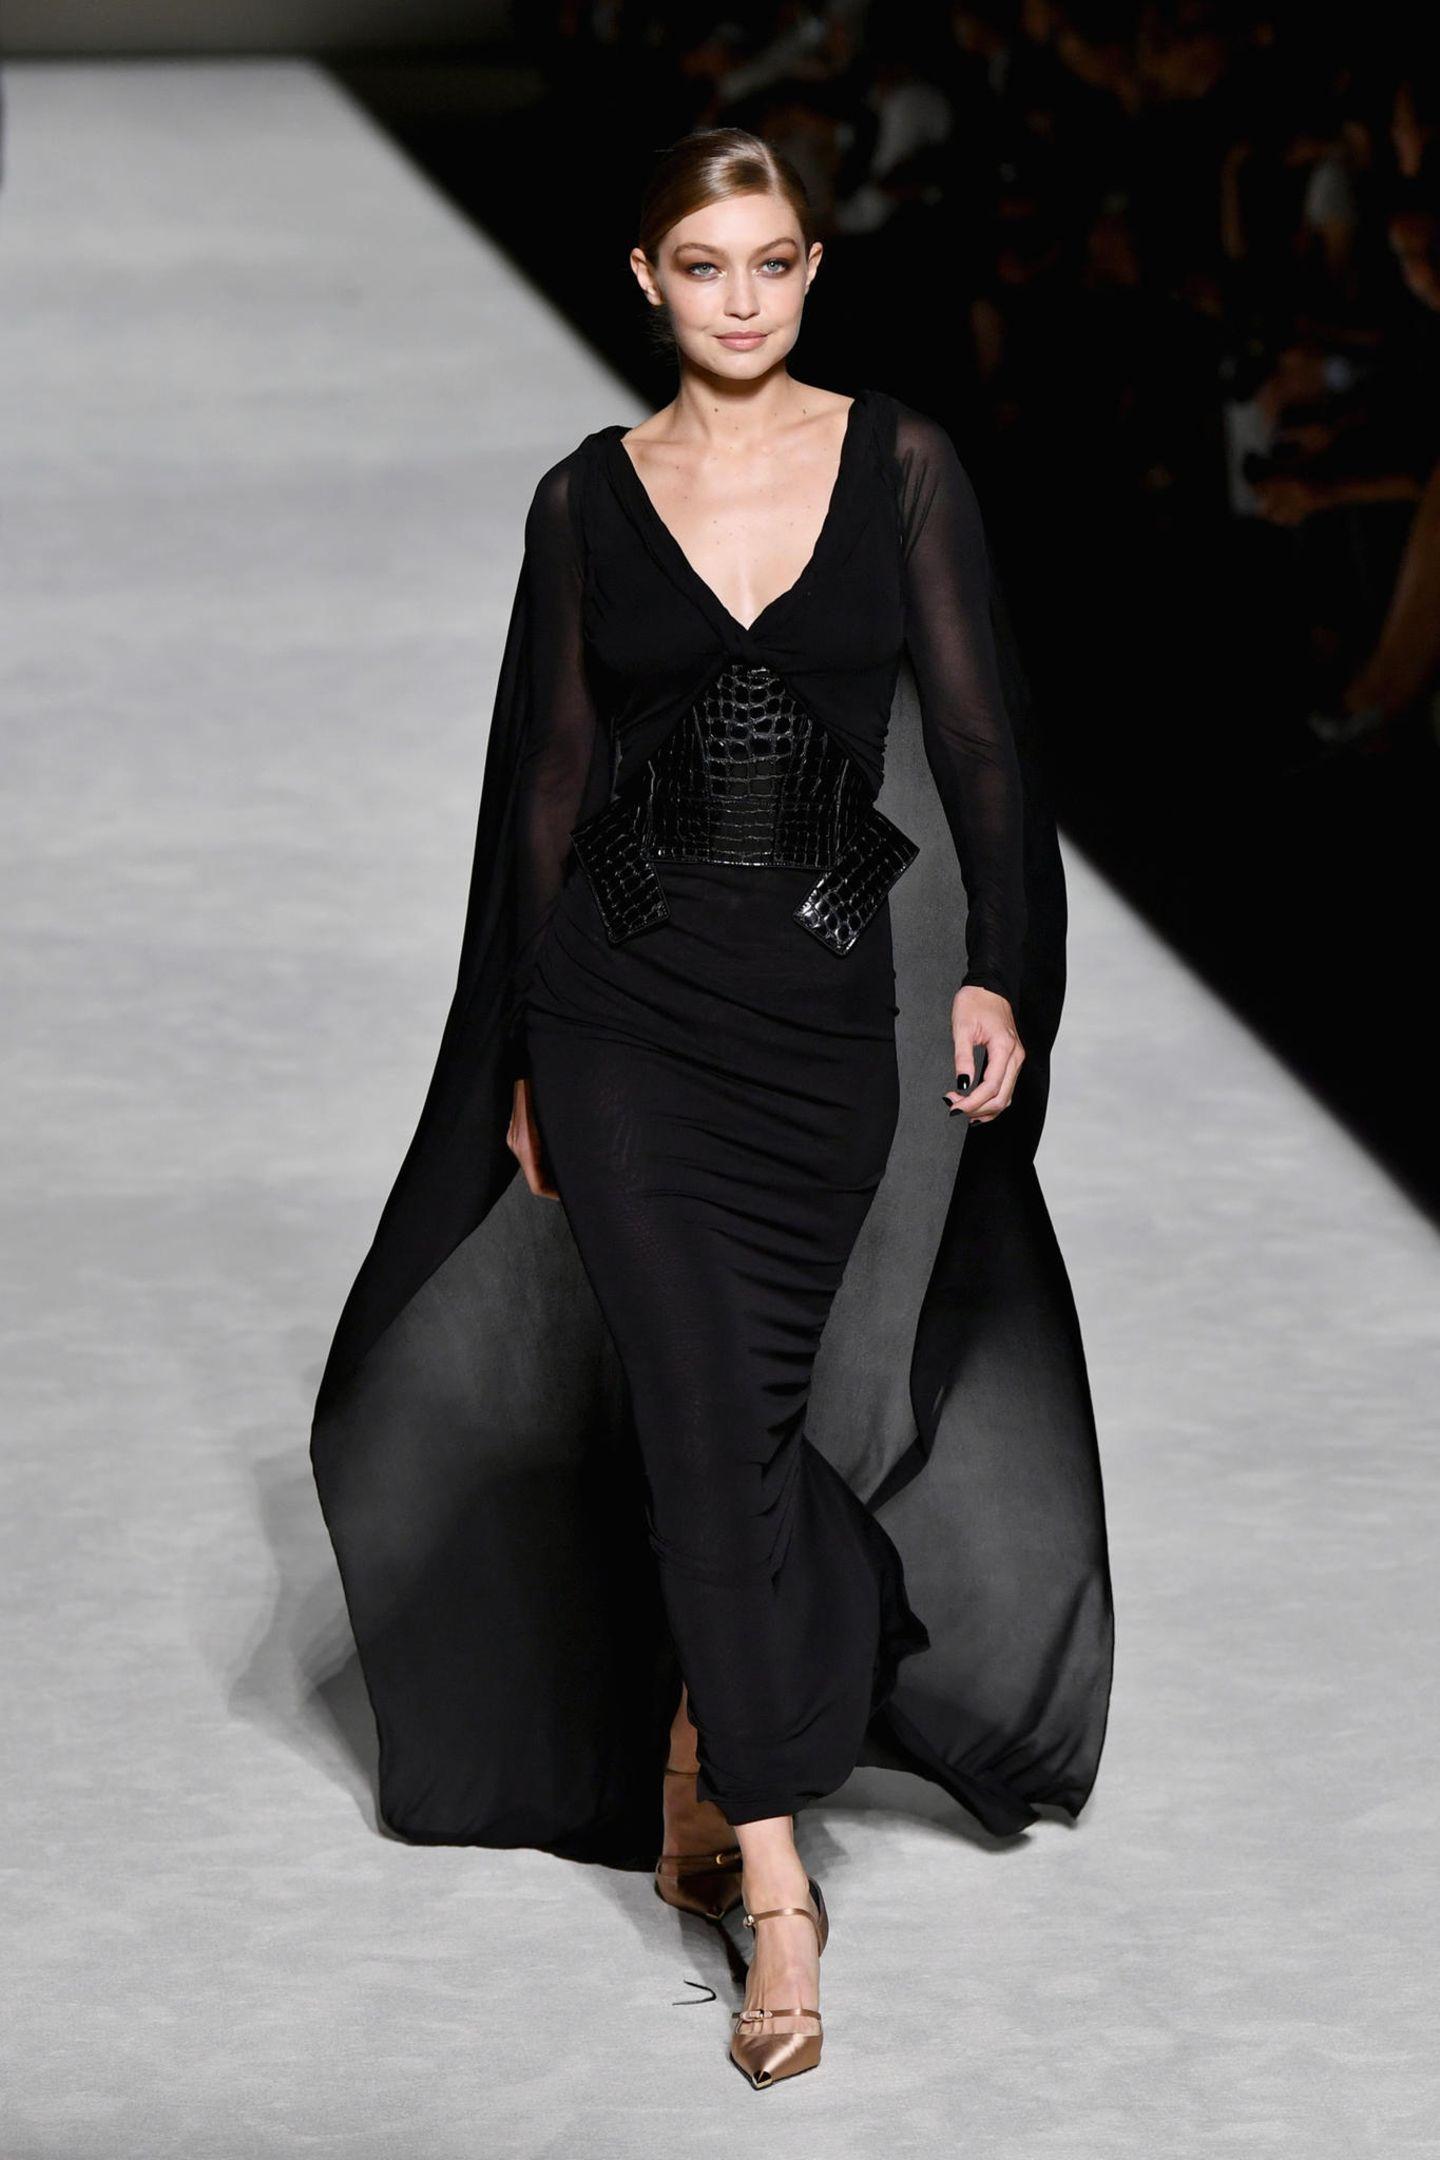 New York Fashion Week: Gigi Hadid